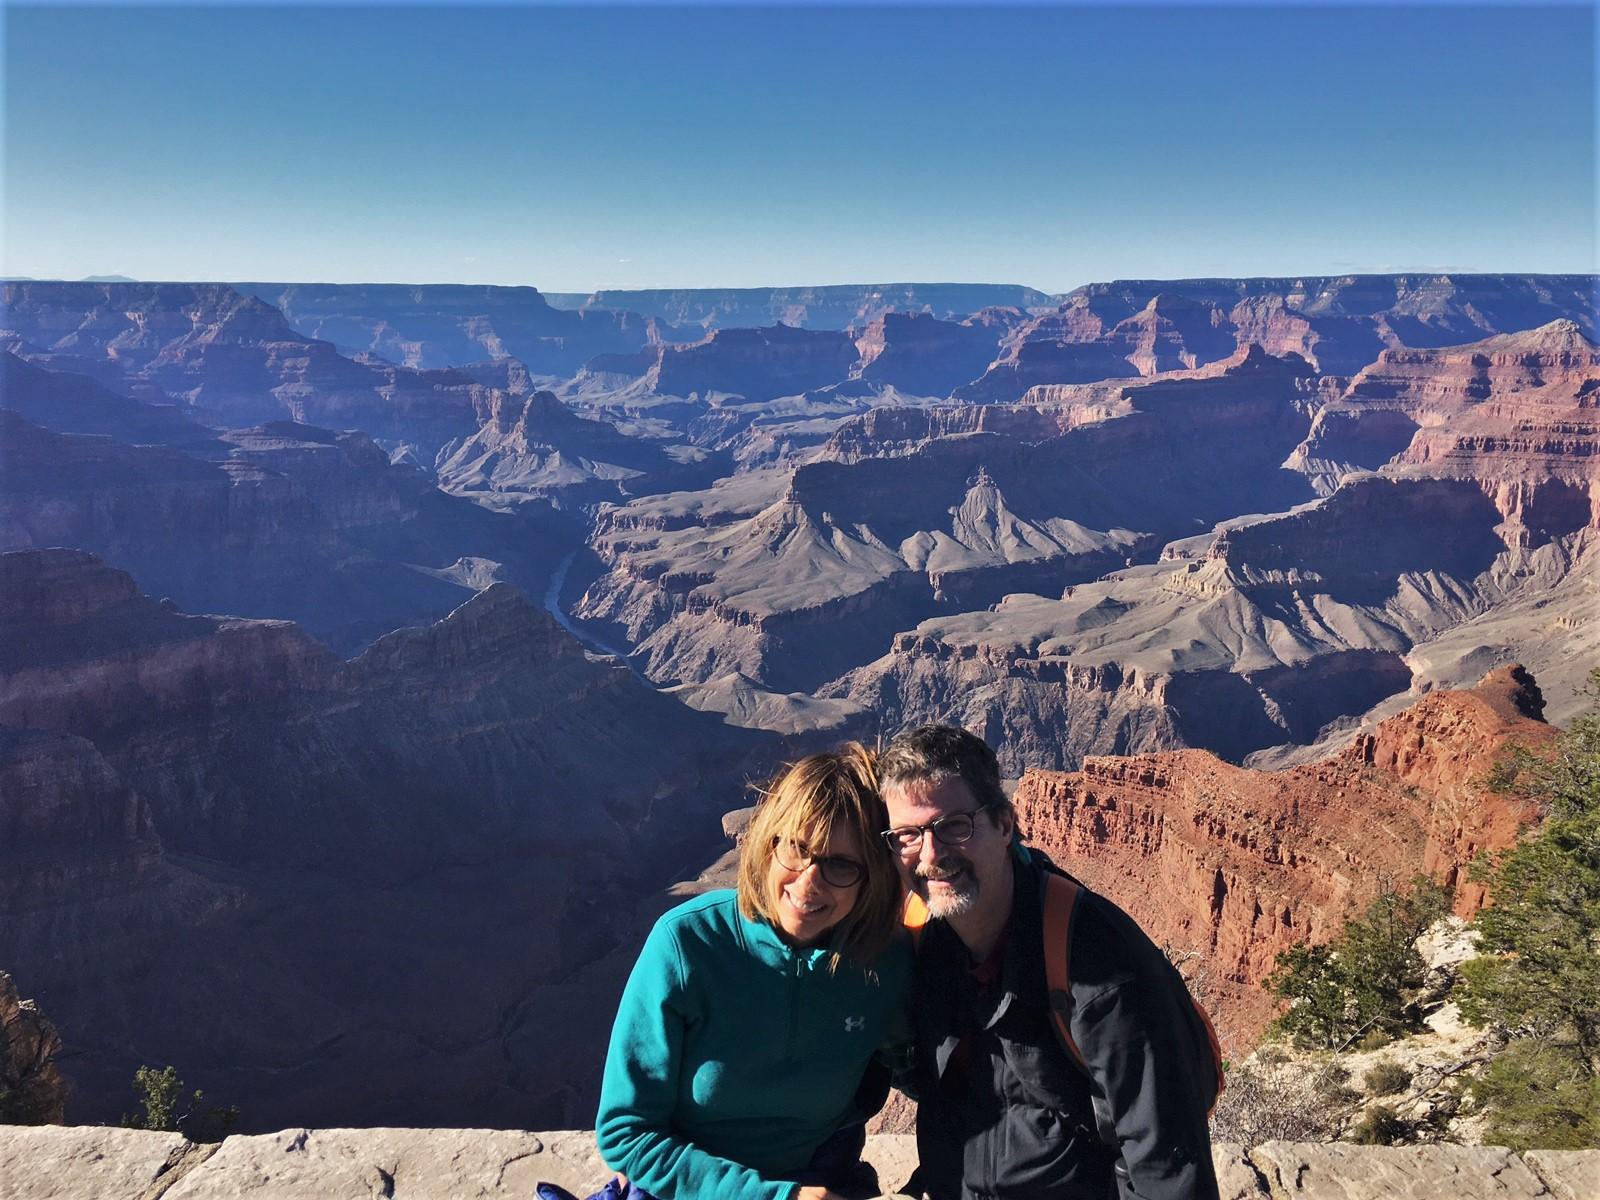 Adey and tom enjoying the grand canyon